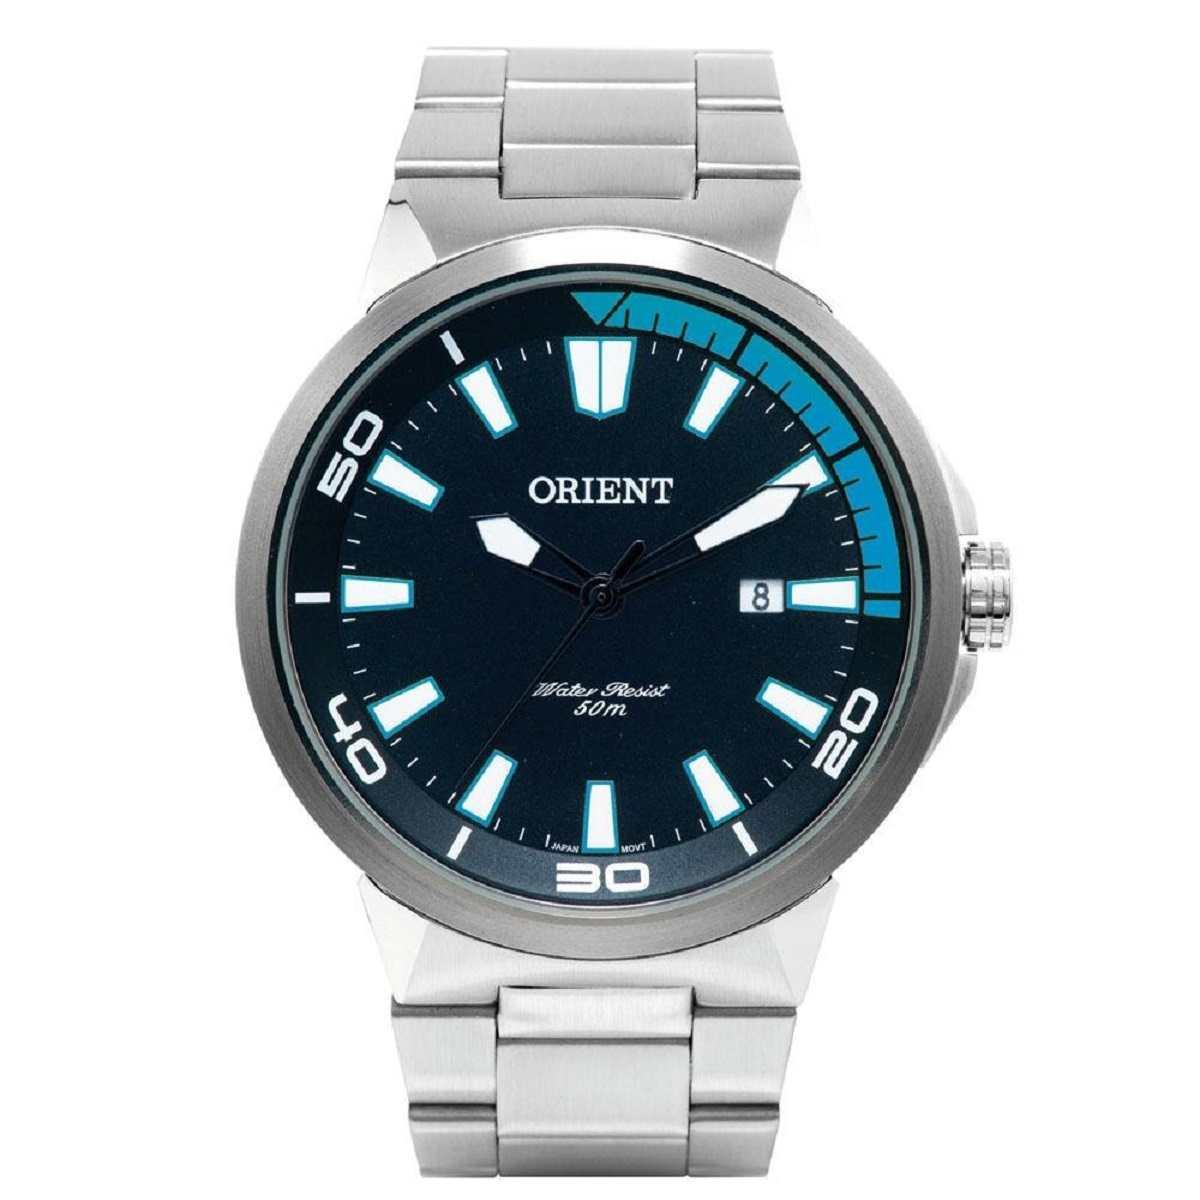 Relógio Masculino Orient Prateado Analógico MBSS1196A PASX